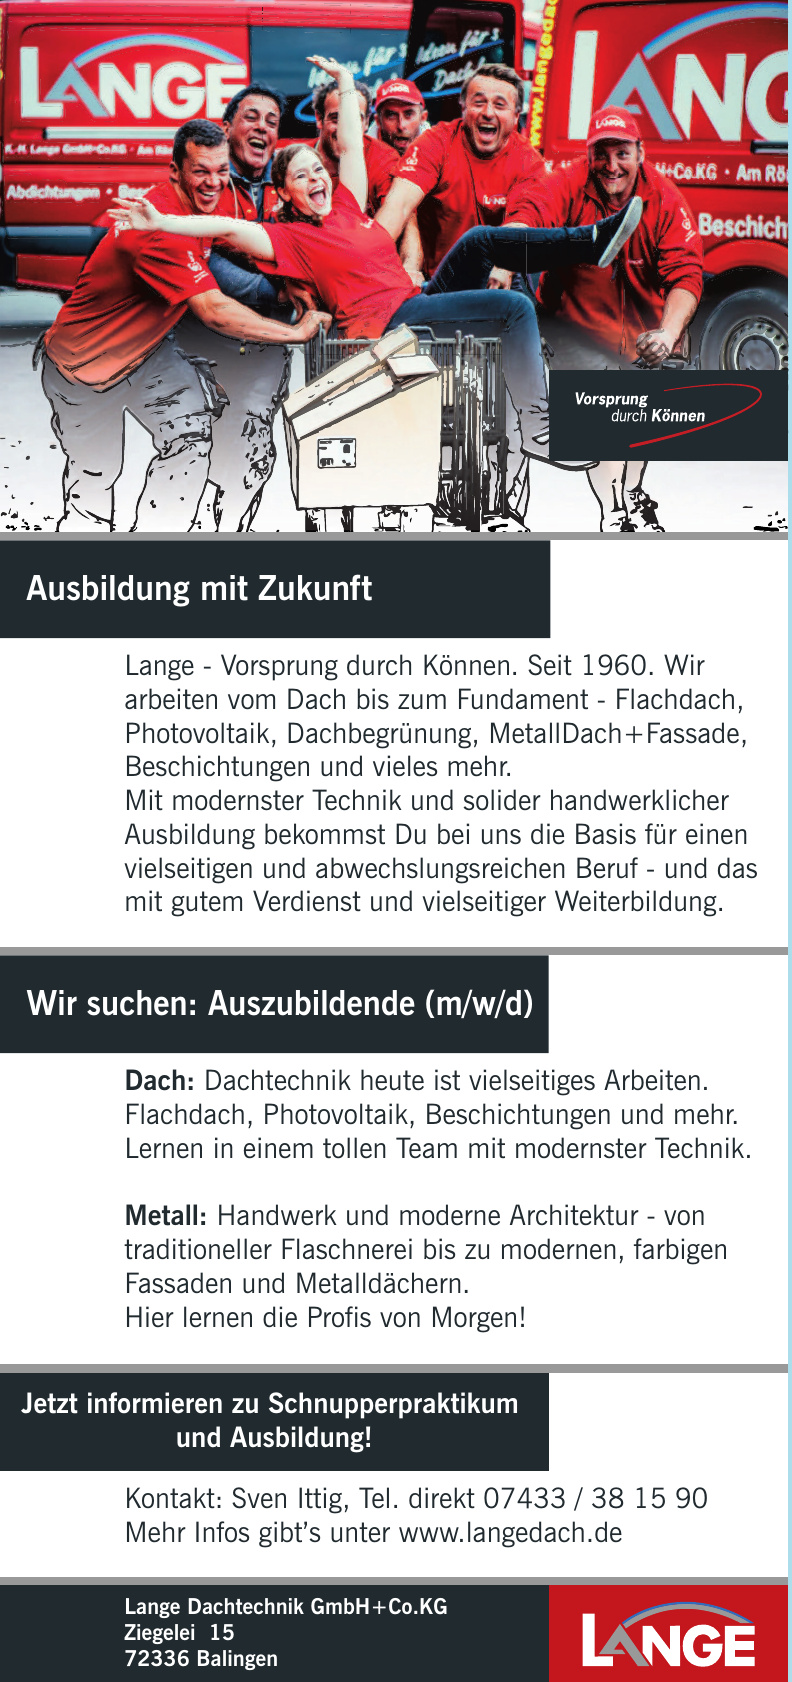 Lange Dachtechnik GmbH+Co.KG